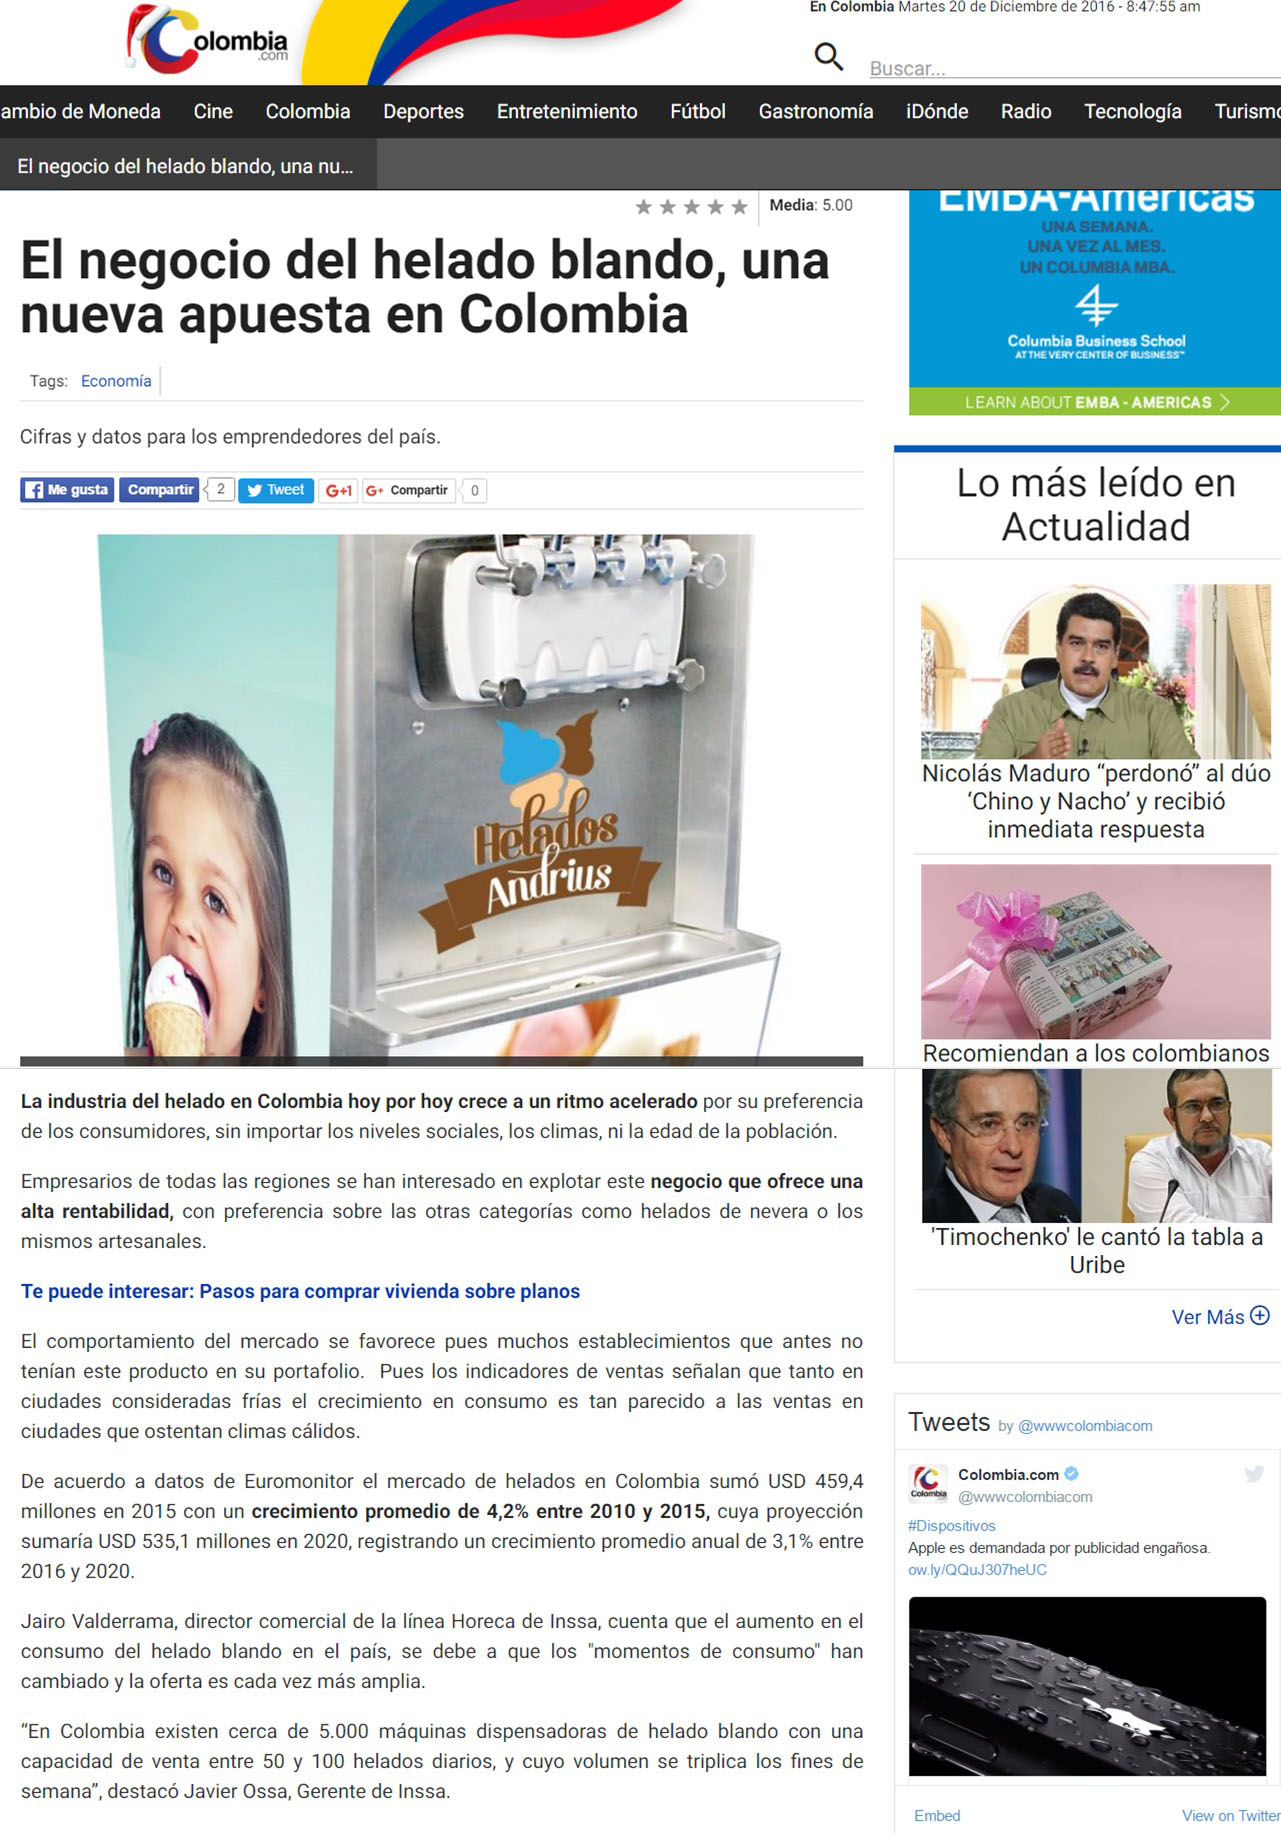 Colombia.com 20 de diciembre de 2016 [web]